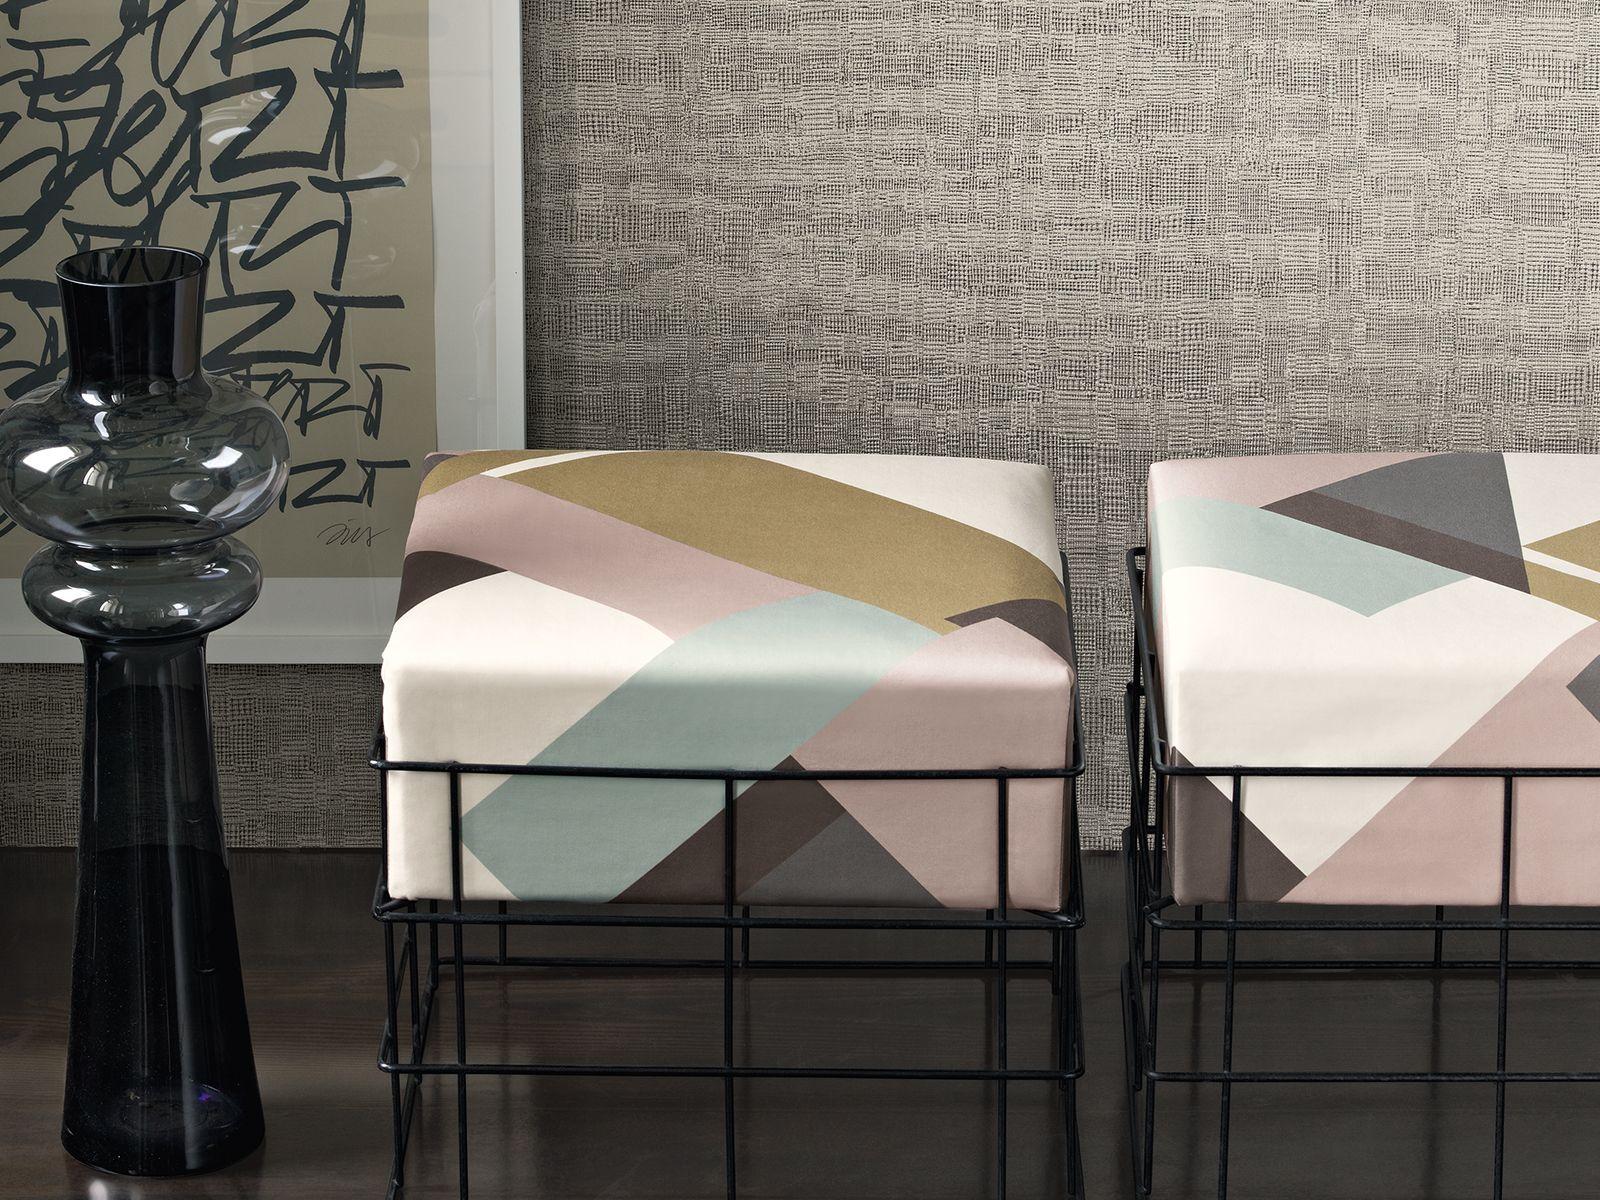 Zimmer + Rohde, living room, Wohnzimmer, Hocker, stool, geometric ...